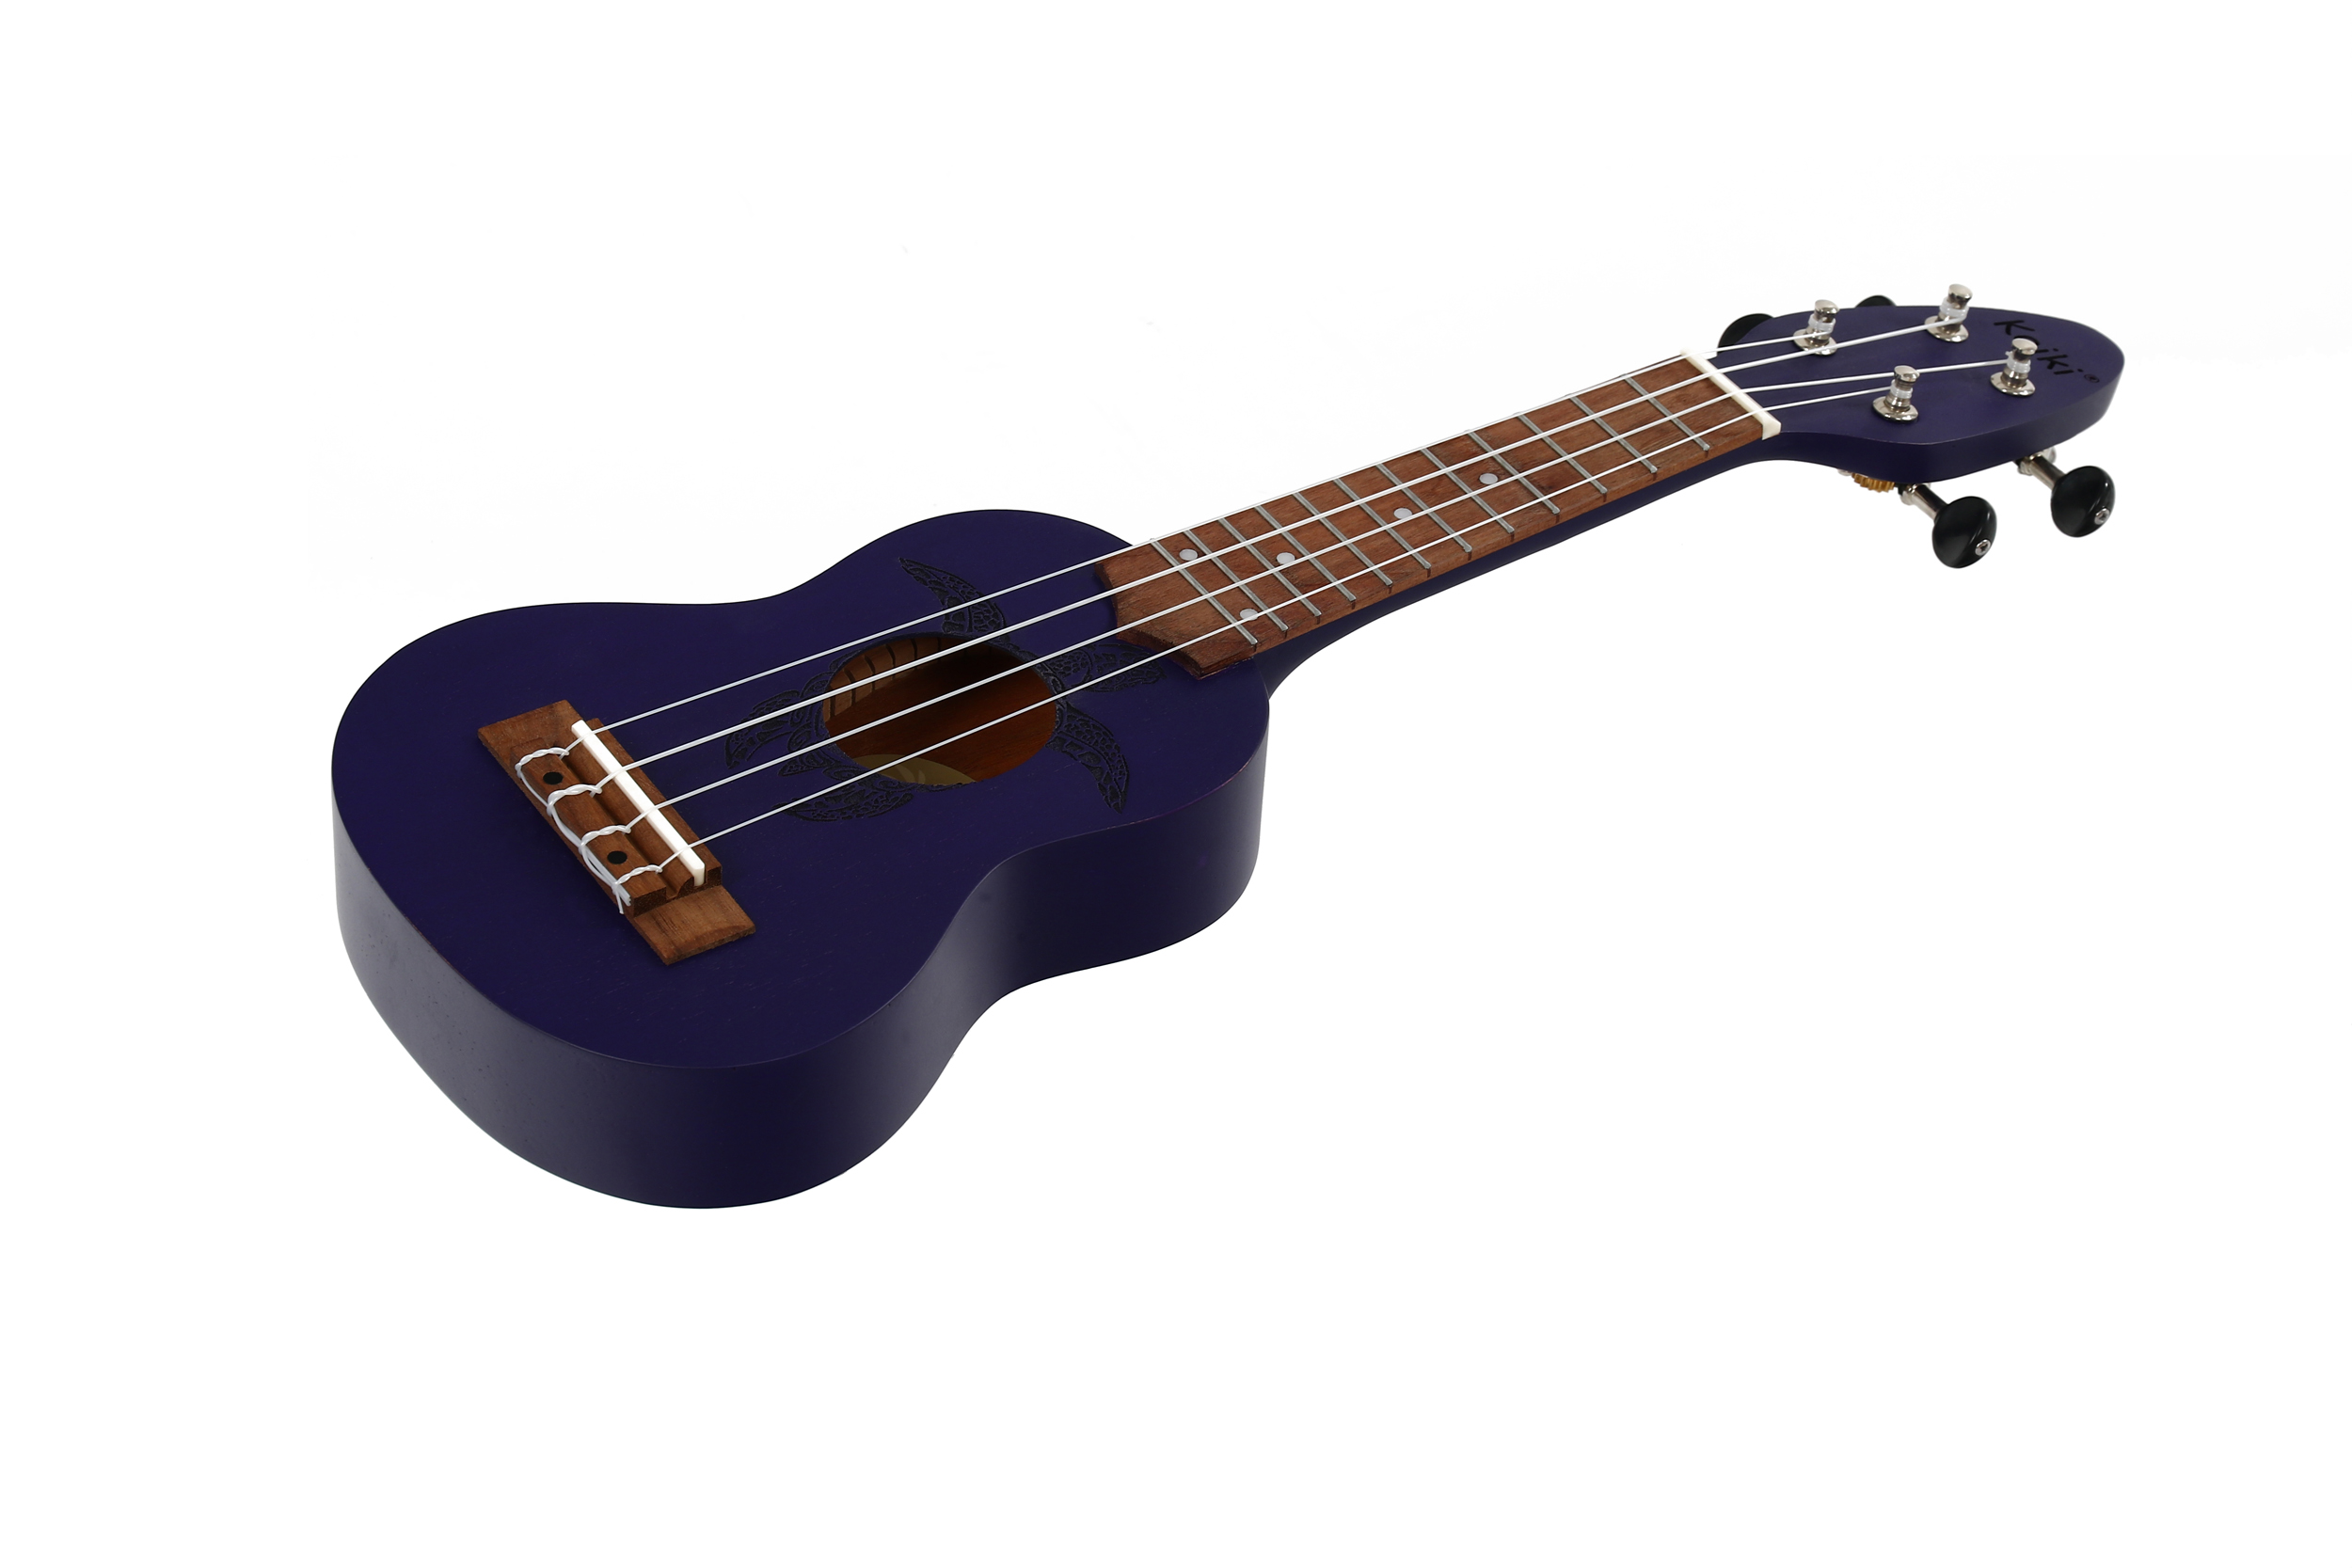 Ortega Keiki K1-PUR_Ukulelen_8_Guitar Shop Corda